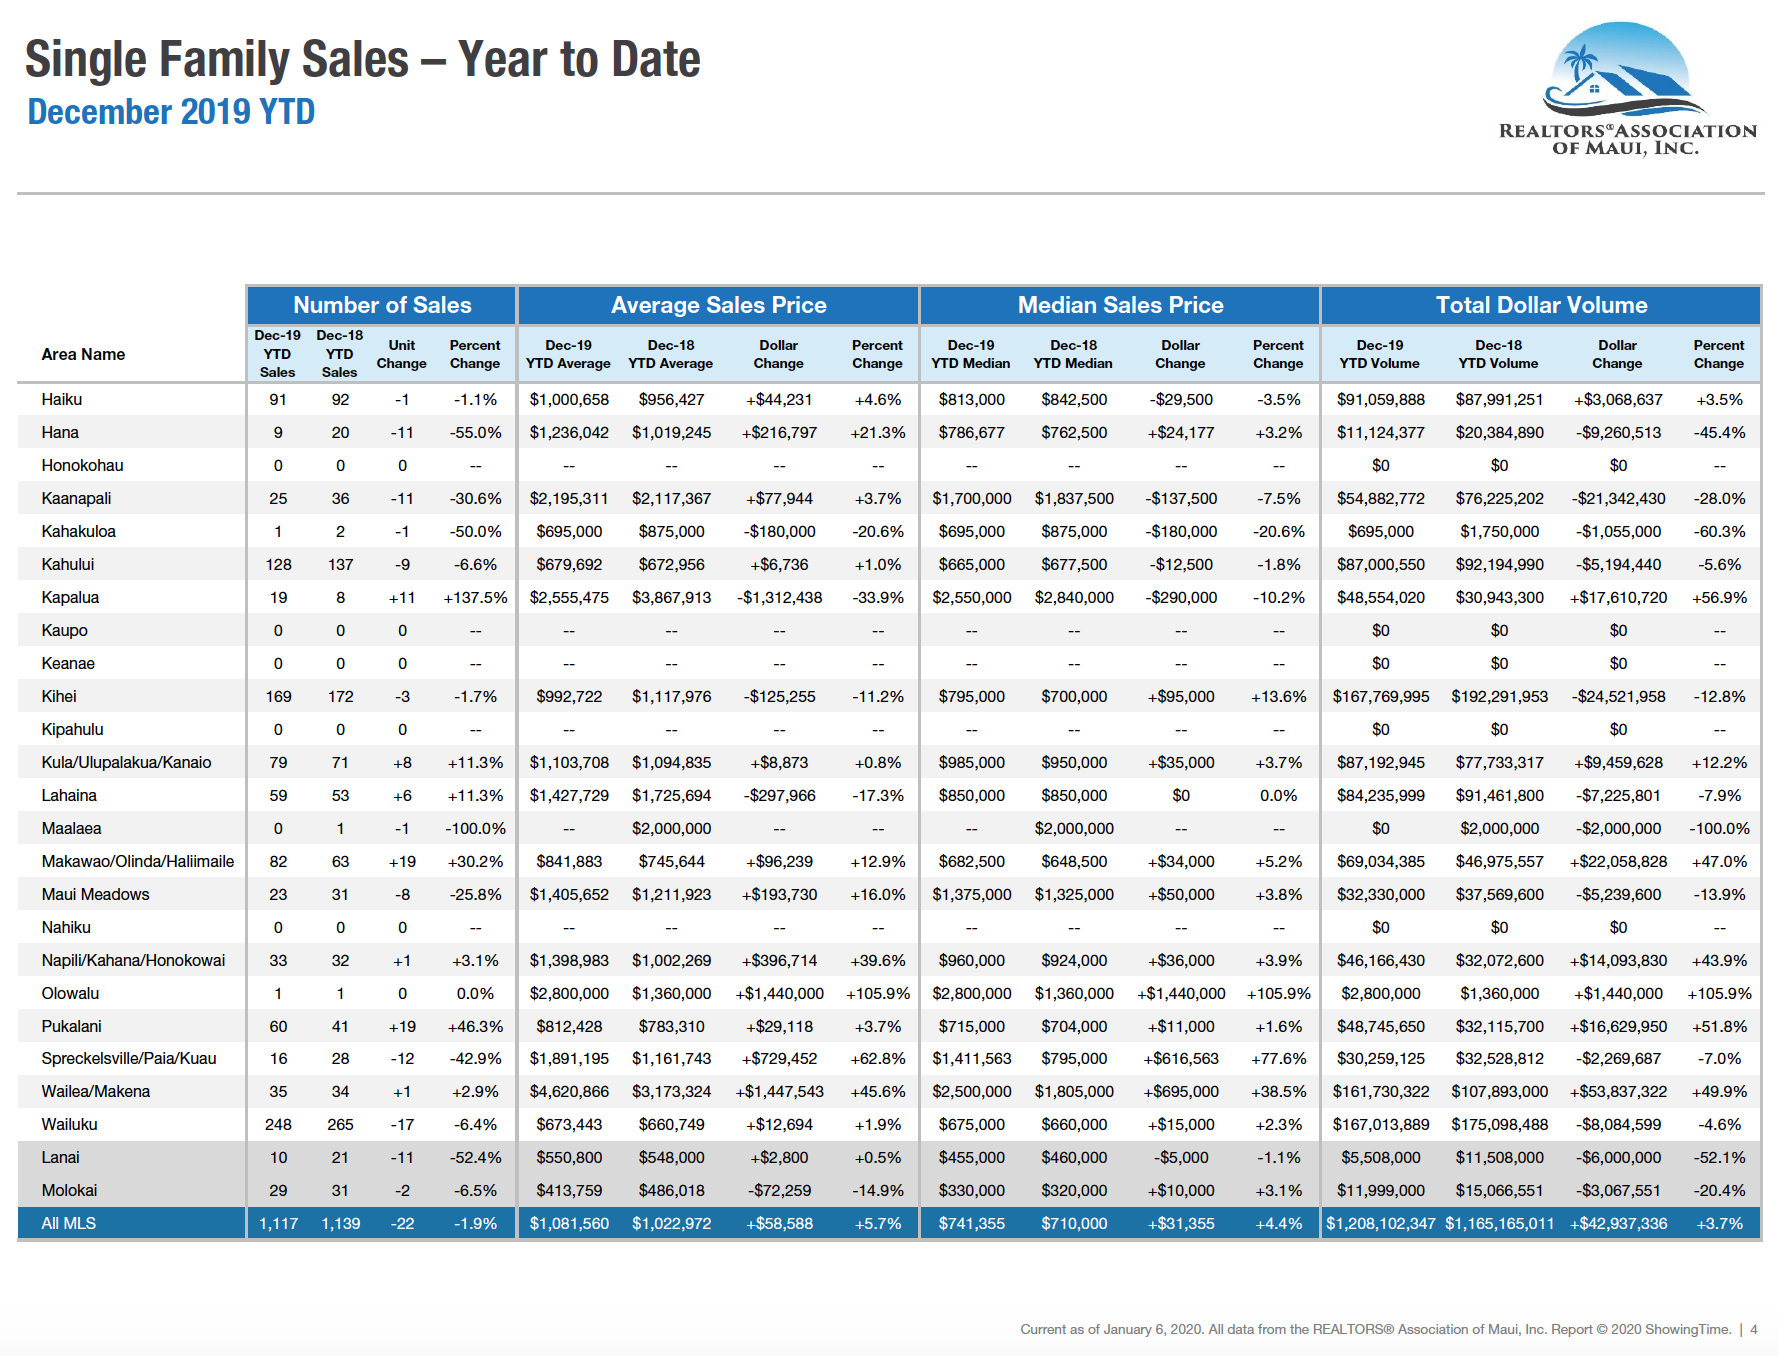 Maui single family home sale statistics for 2019.